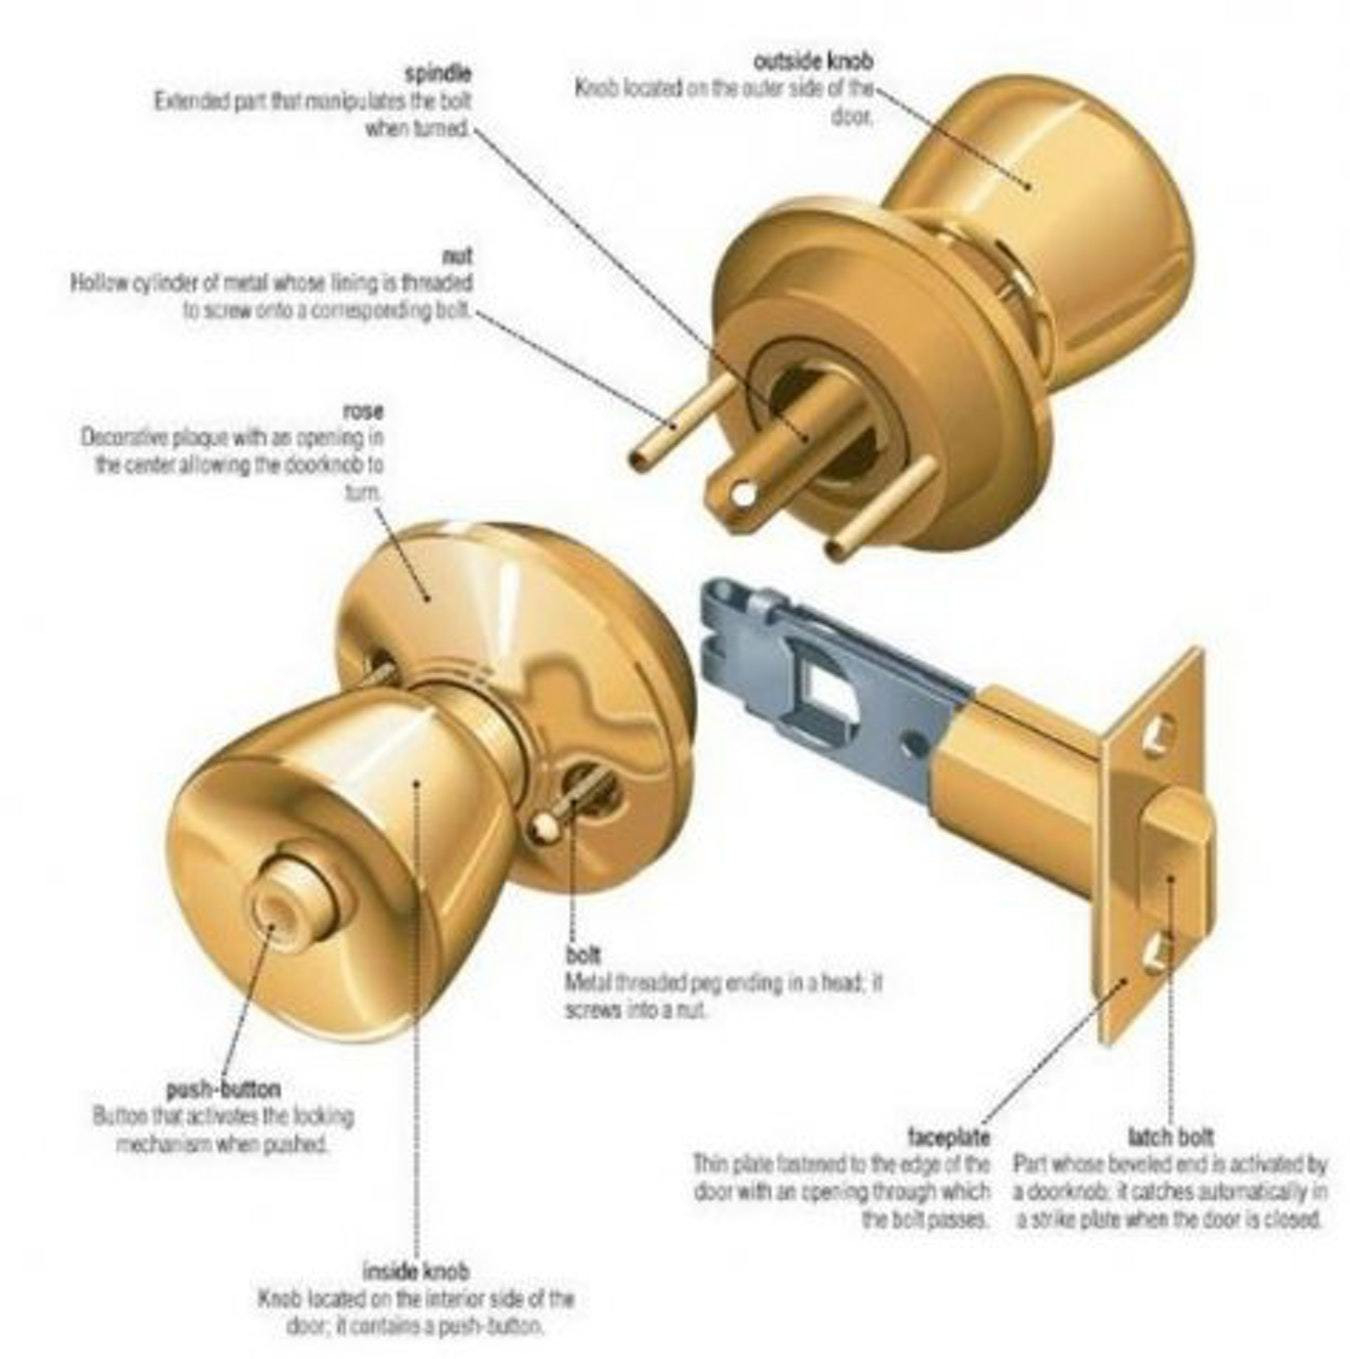 anatomy of a door knob lock knobs ideas site. Black Bedroom Furniture Sets. Home Design Ideas